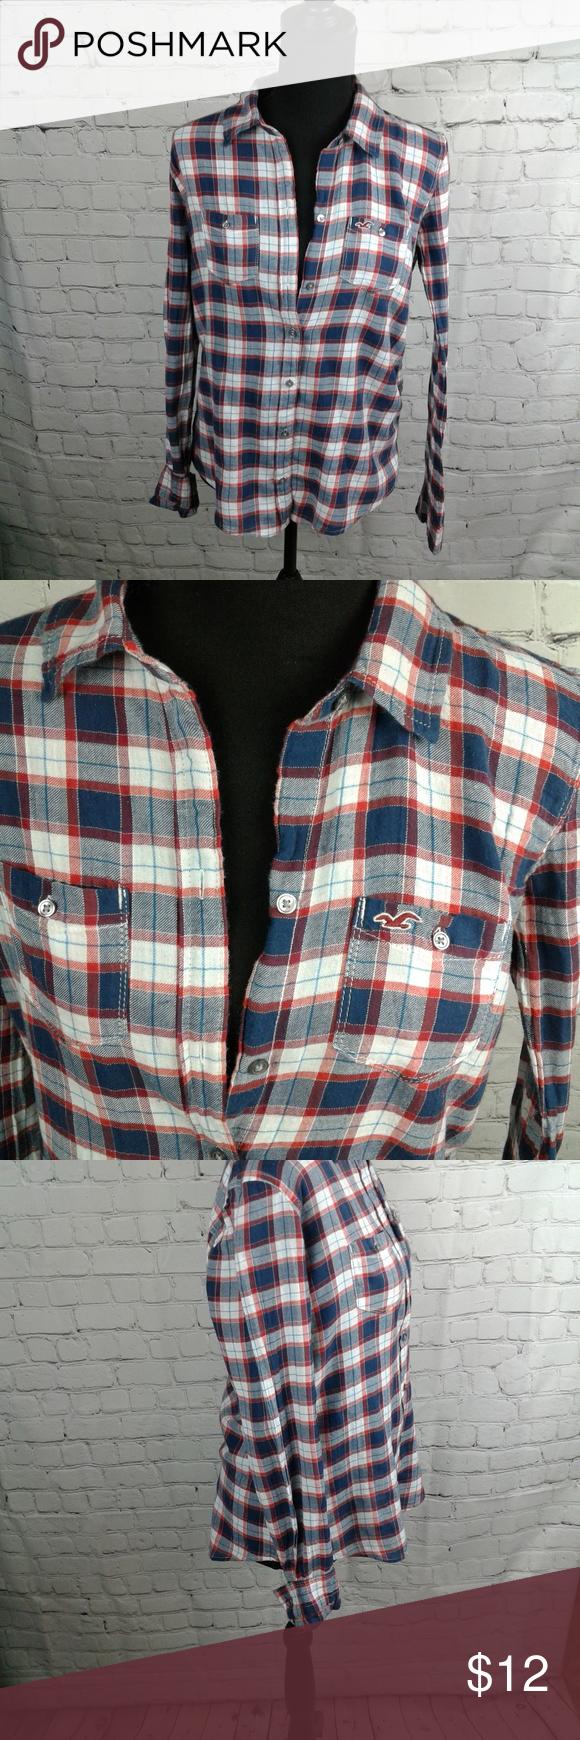 Hollister flannel shirts womens  Hollister Flannel  My Posh Closet  Pinterest  Flannels